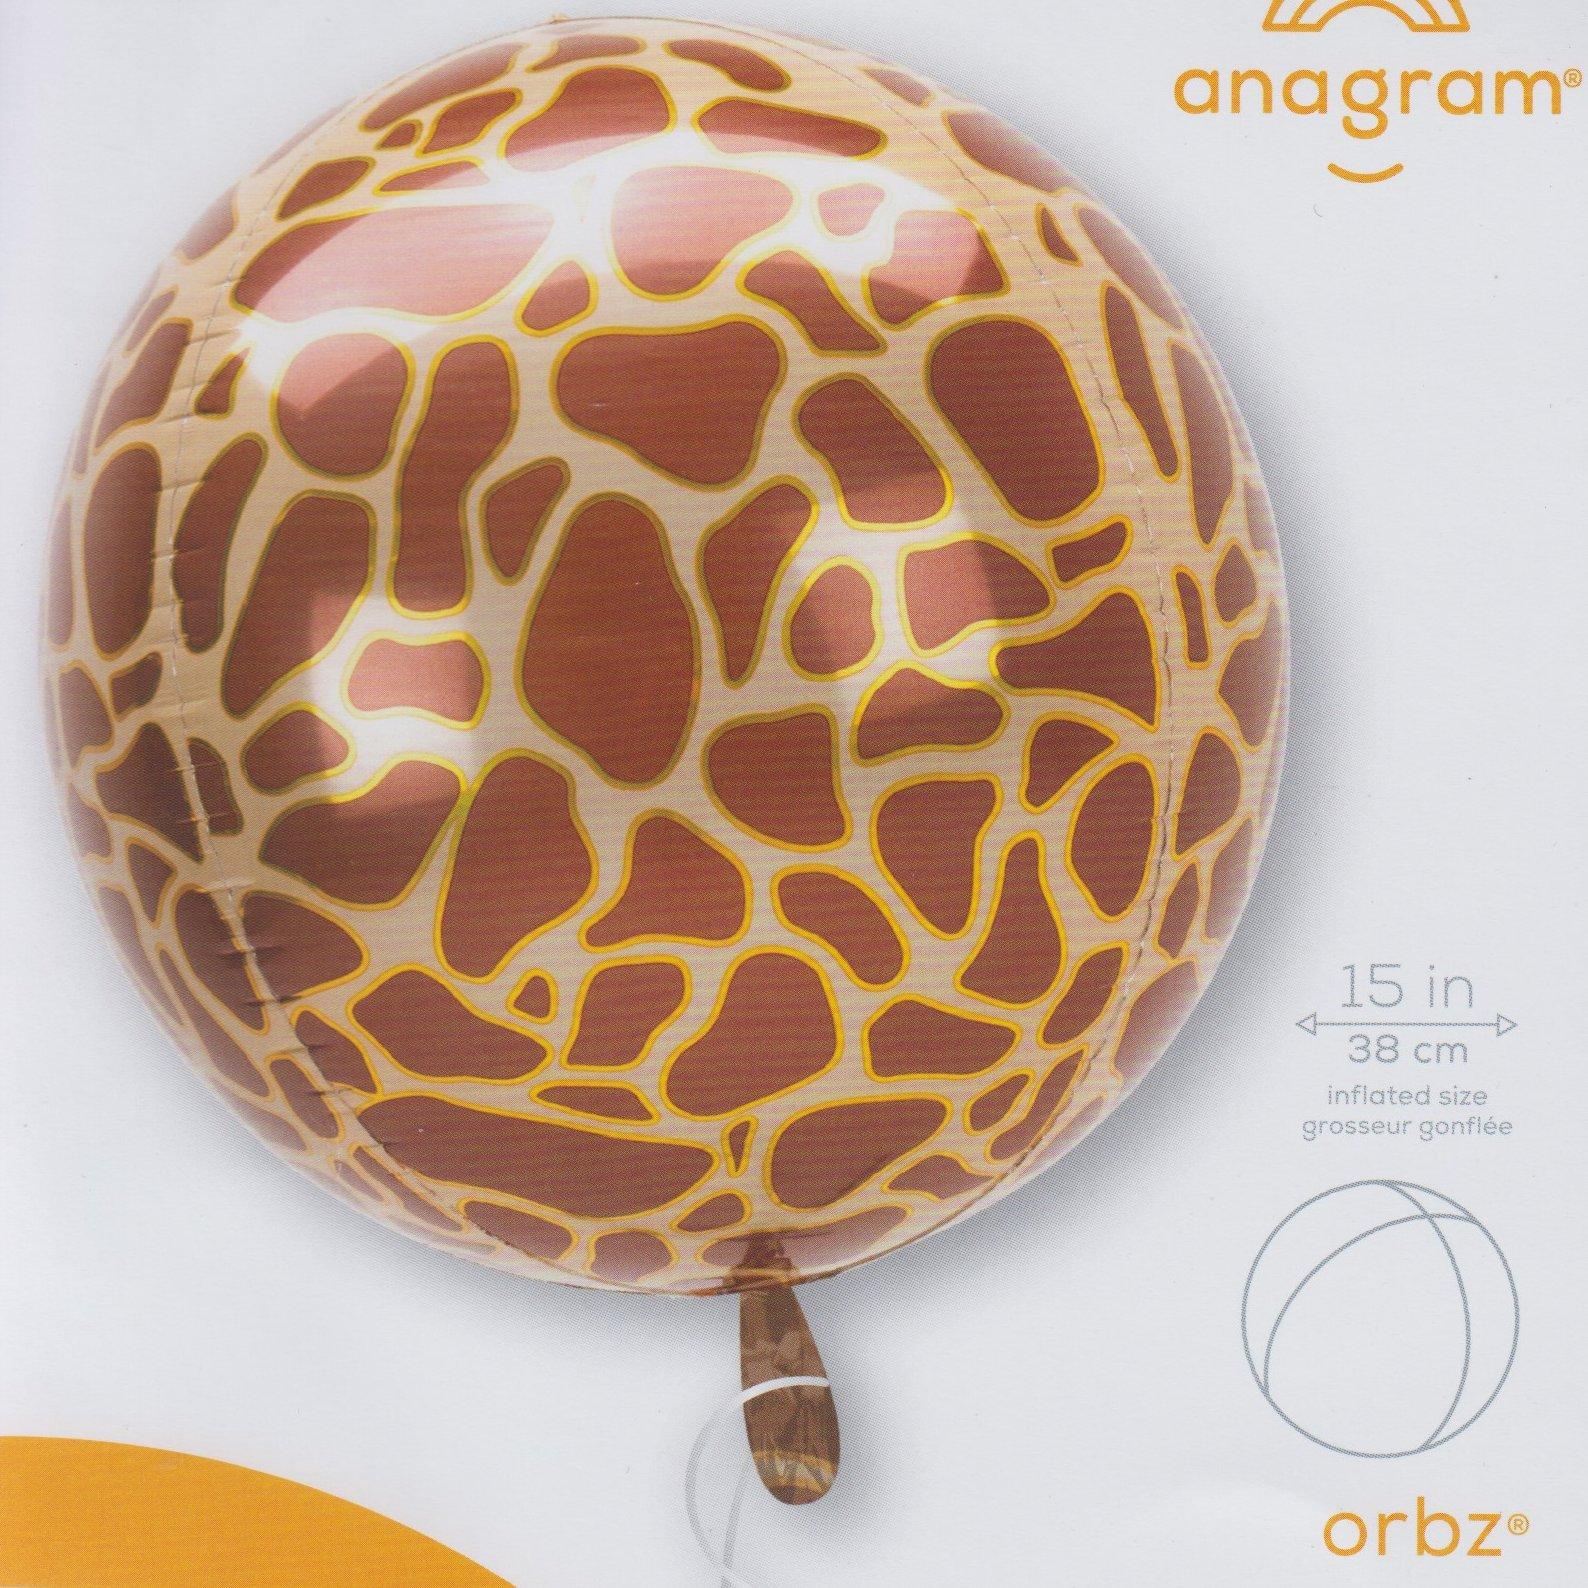 Orbz Giraffe Print